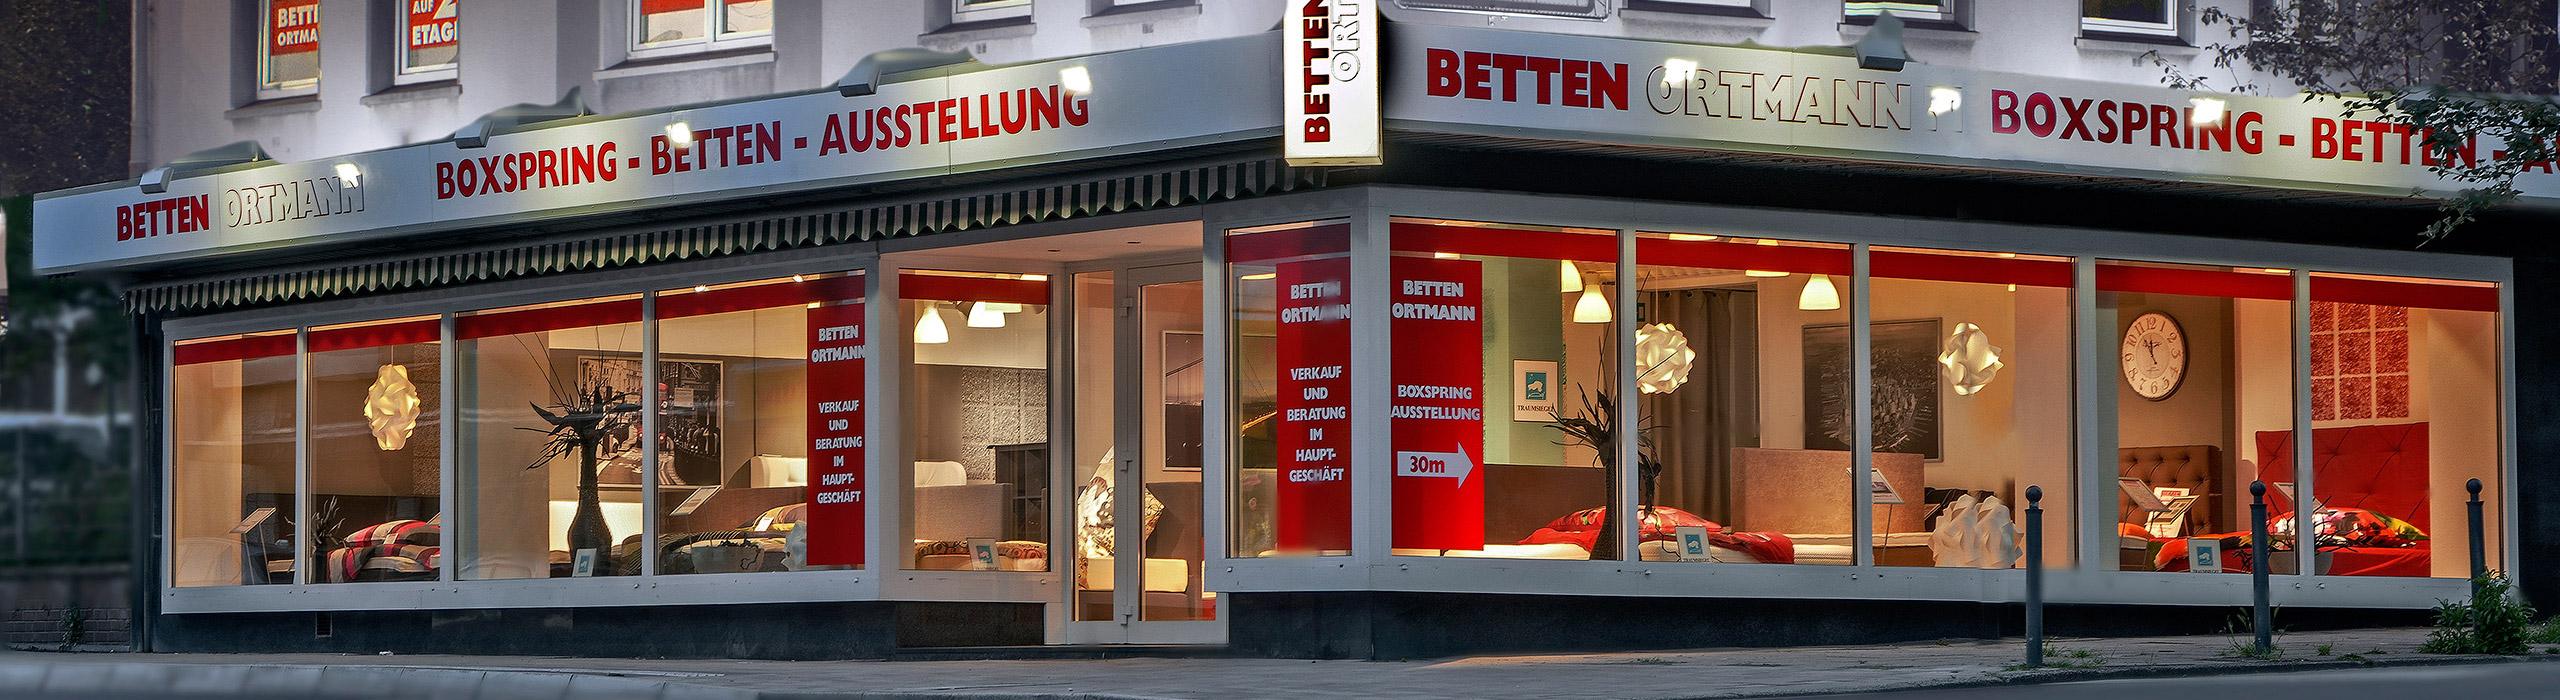 haus garten betten und badezimmer in oberhausen infobel deutschland. Black Bedroom Furniture Sets. Home Design Ideas